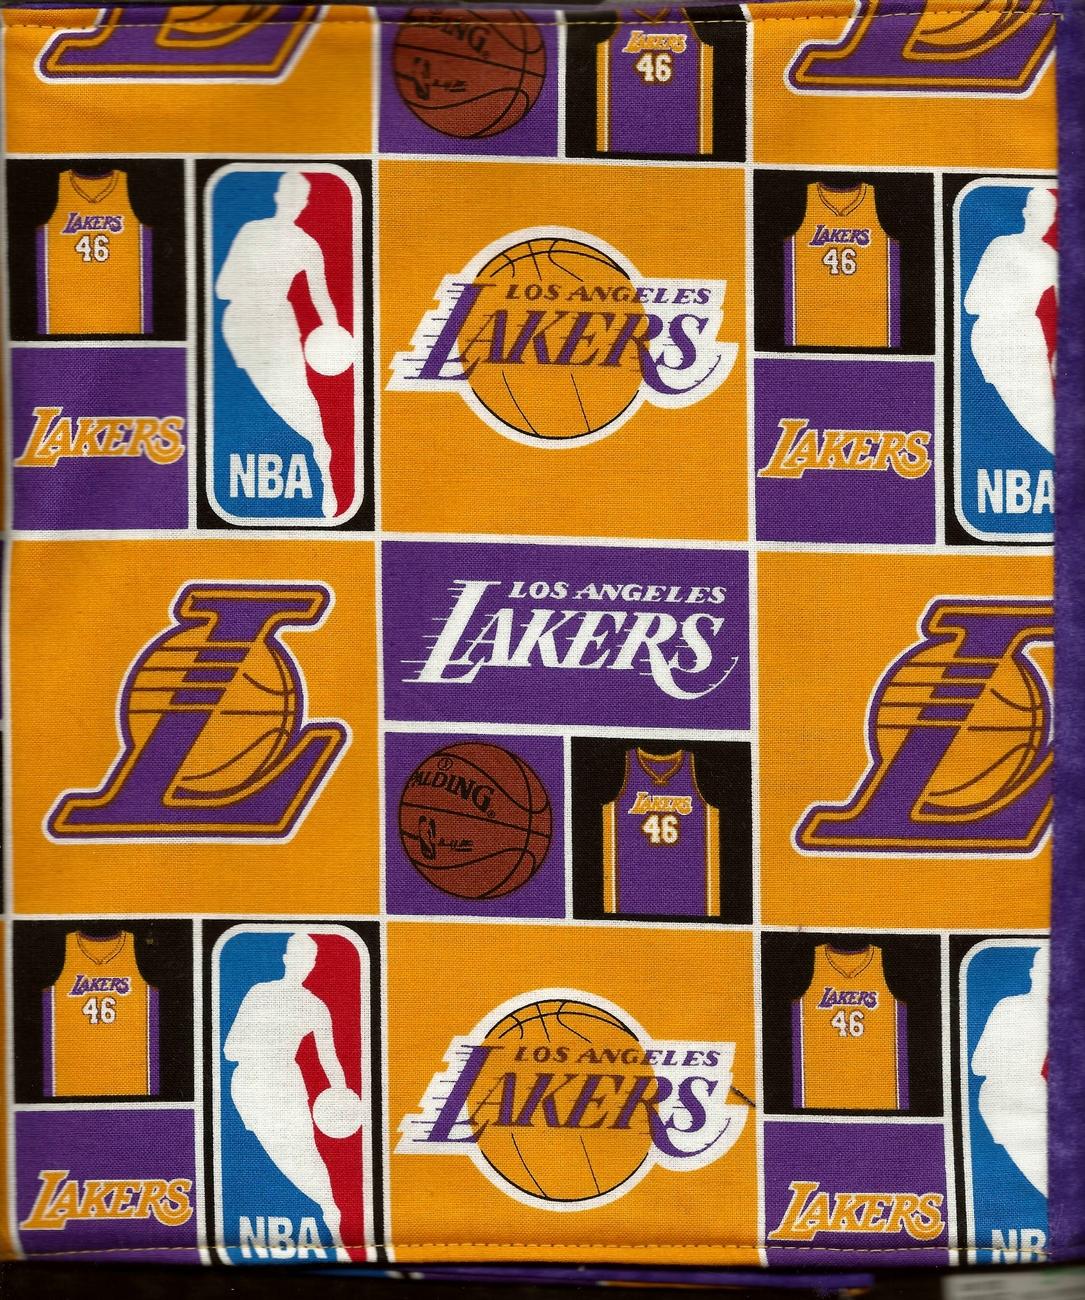 Los Angeles Lakers Design Custom Made Apple iPad Folio Cover Case W/Velco Snap